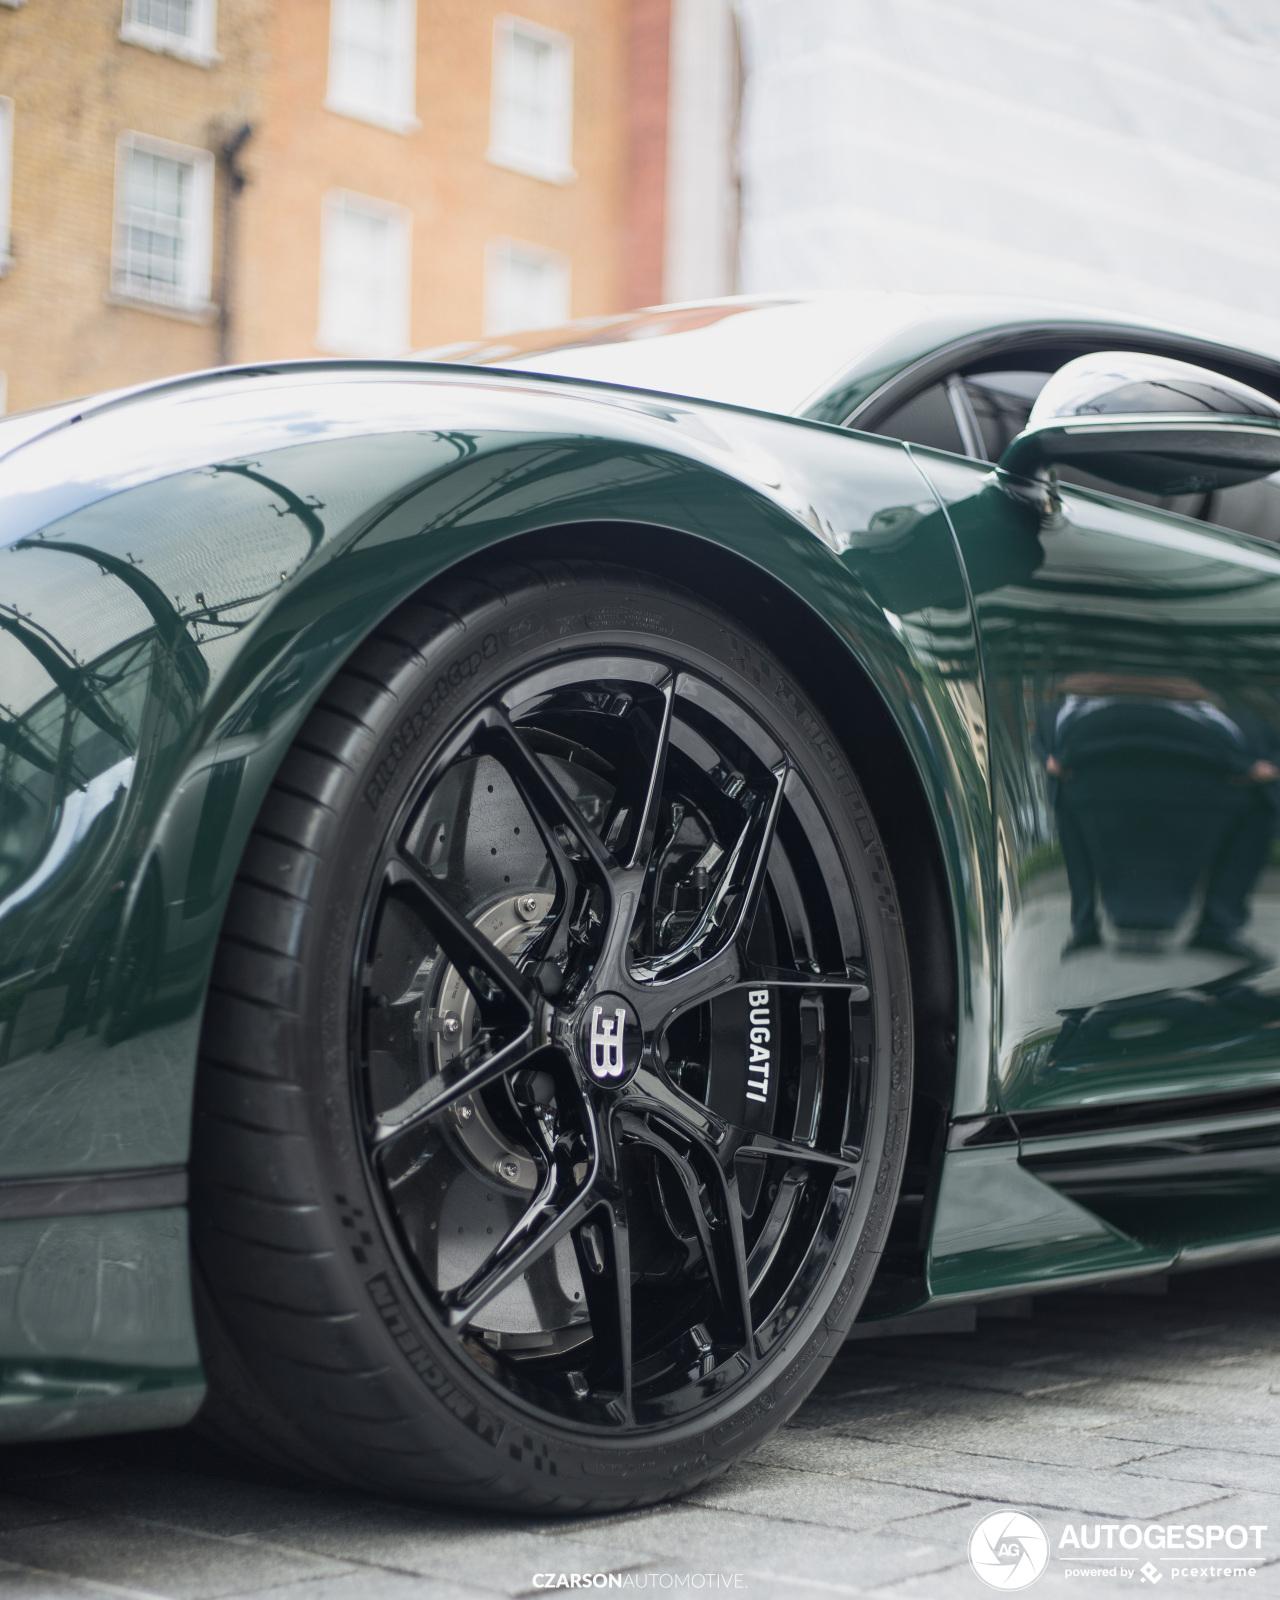 Bugatti Chiron Sport Top Speed: Bugatti Chiron Sport